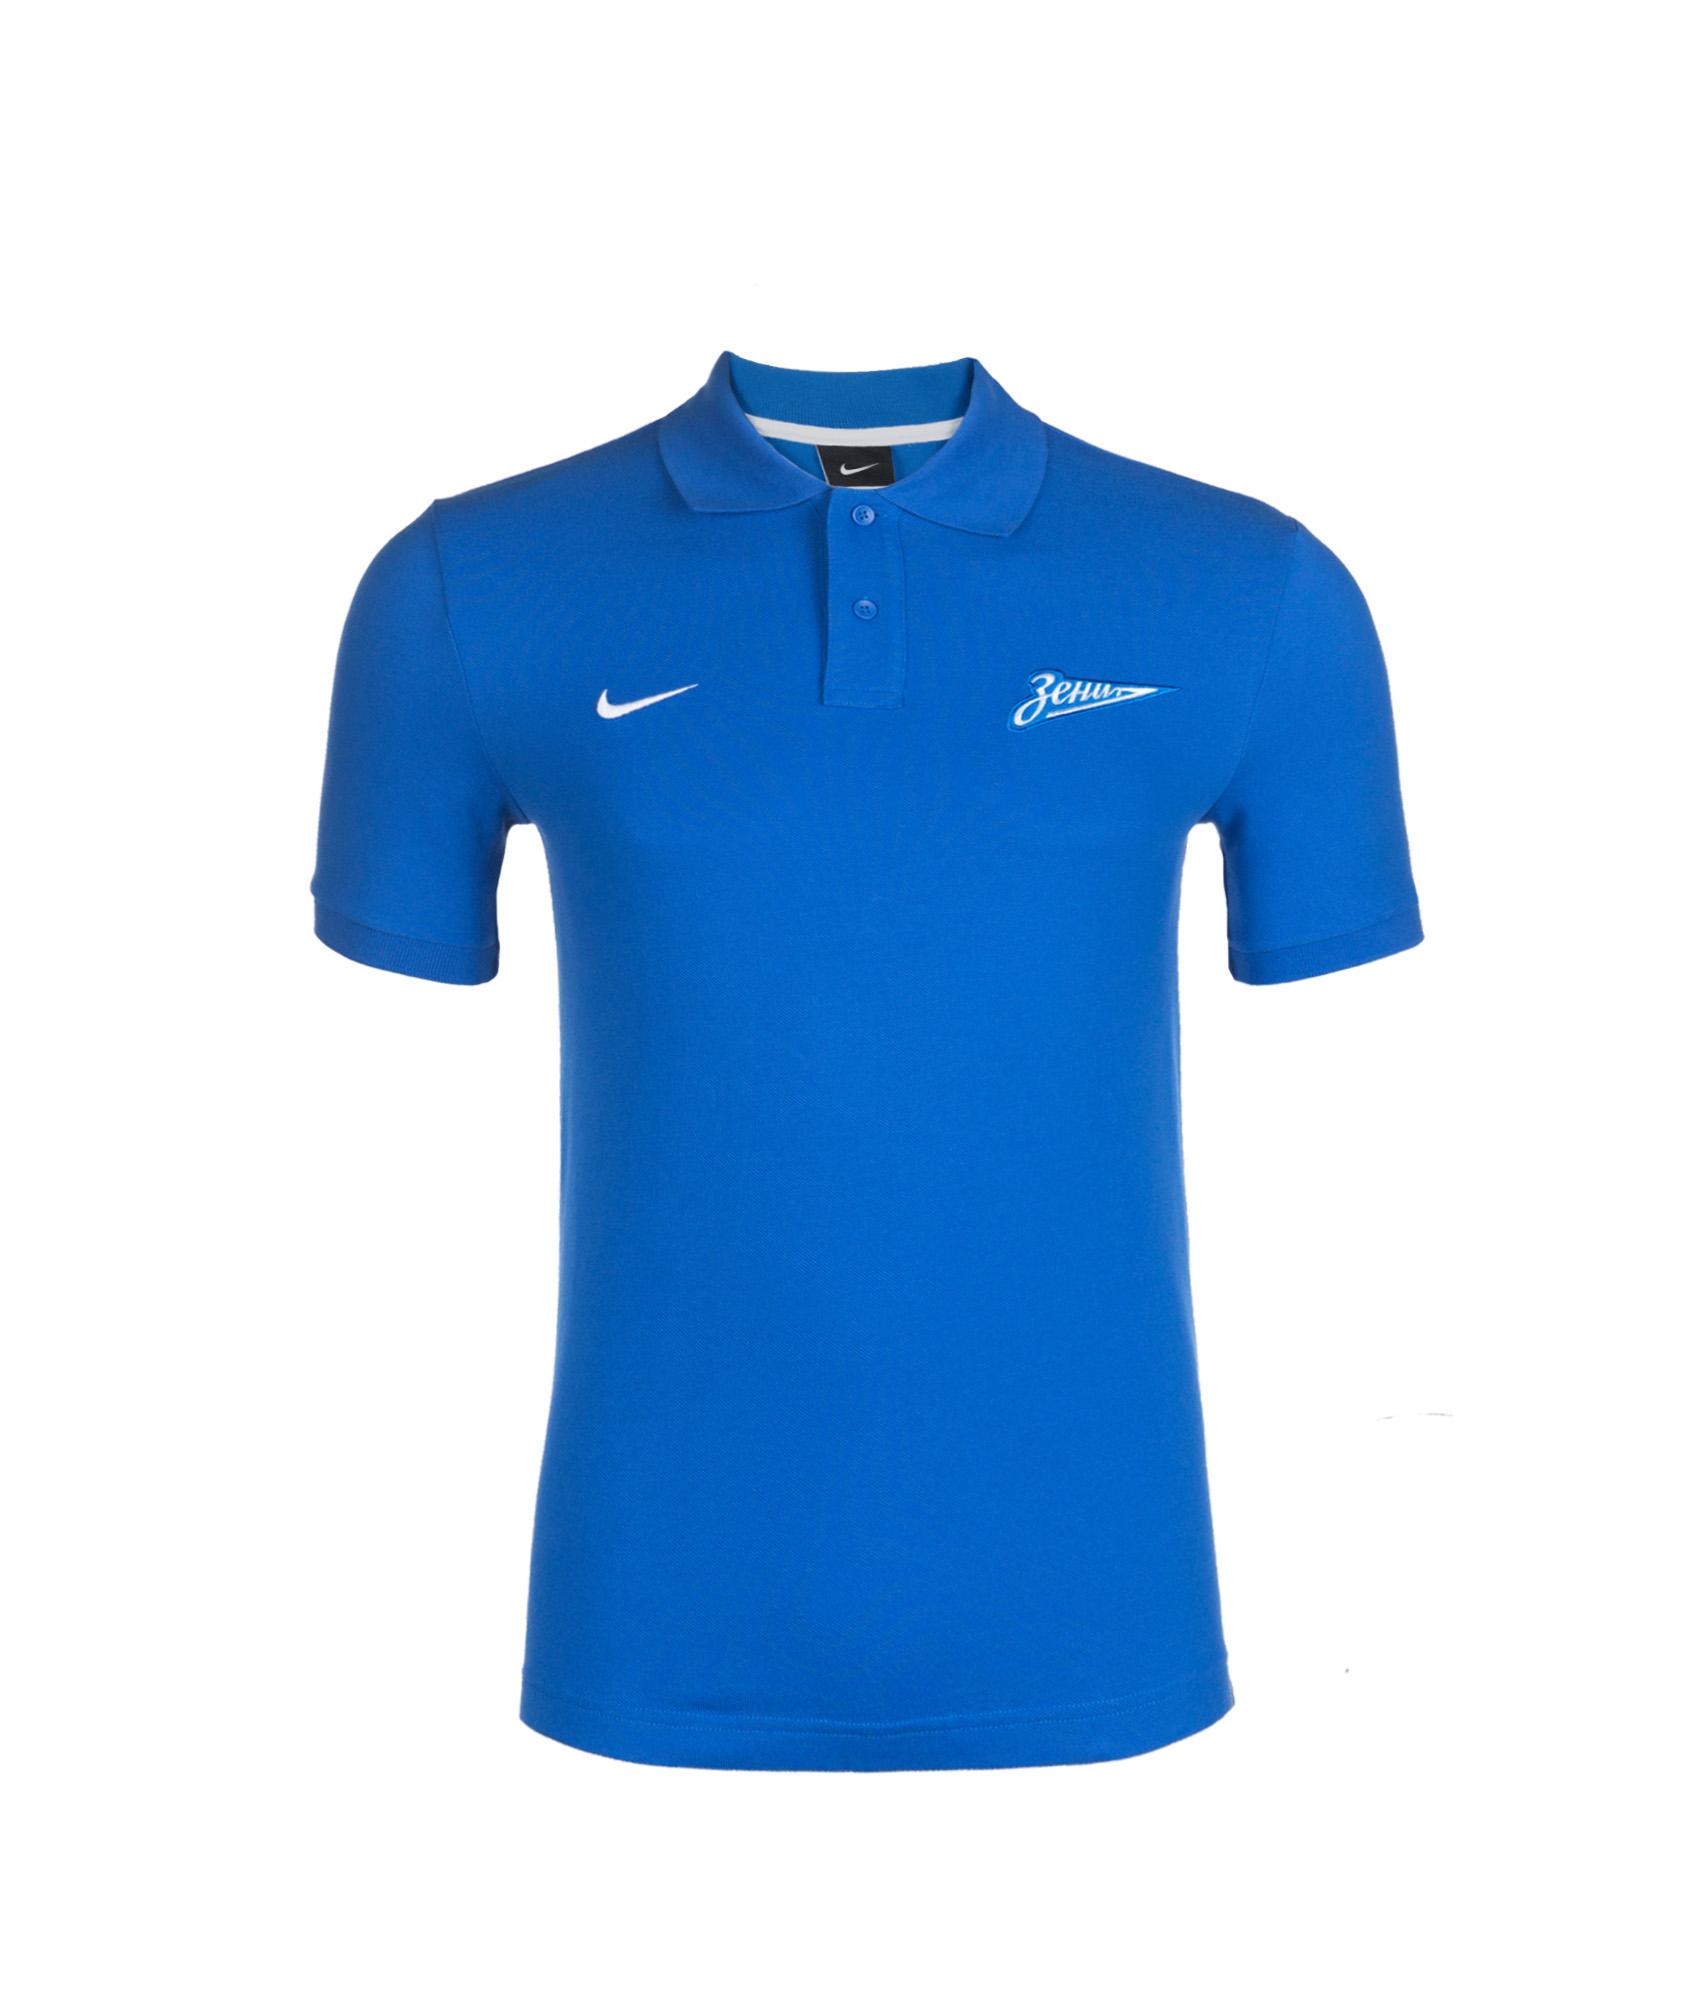 Поло Nike GS Generic Auth, Цвет-Синий, Размер-XXL